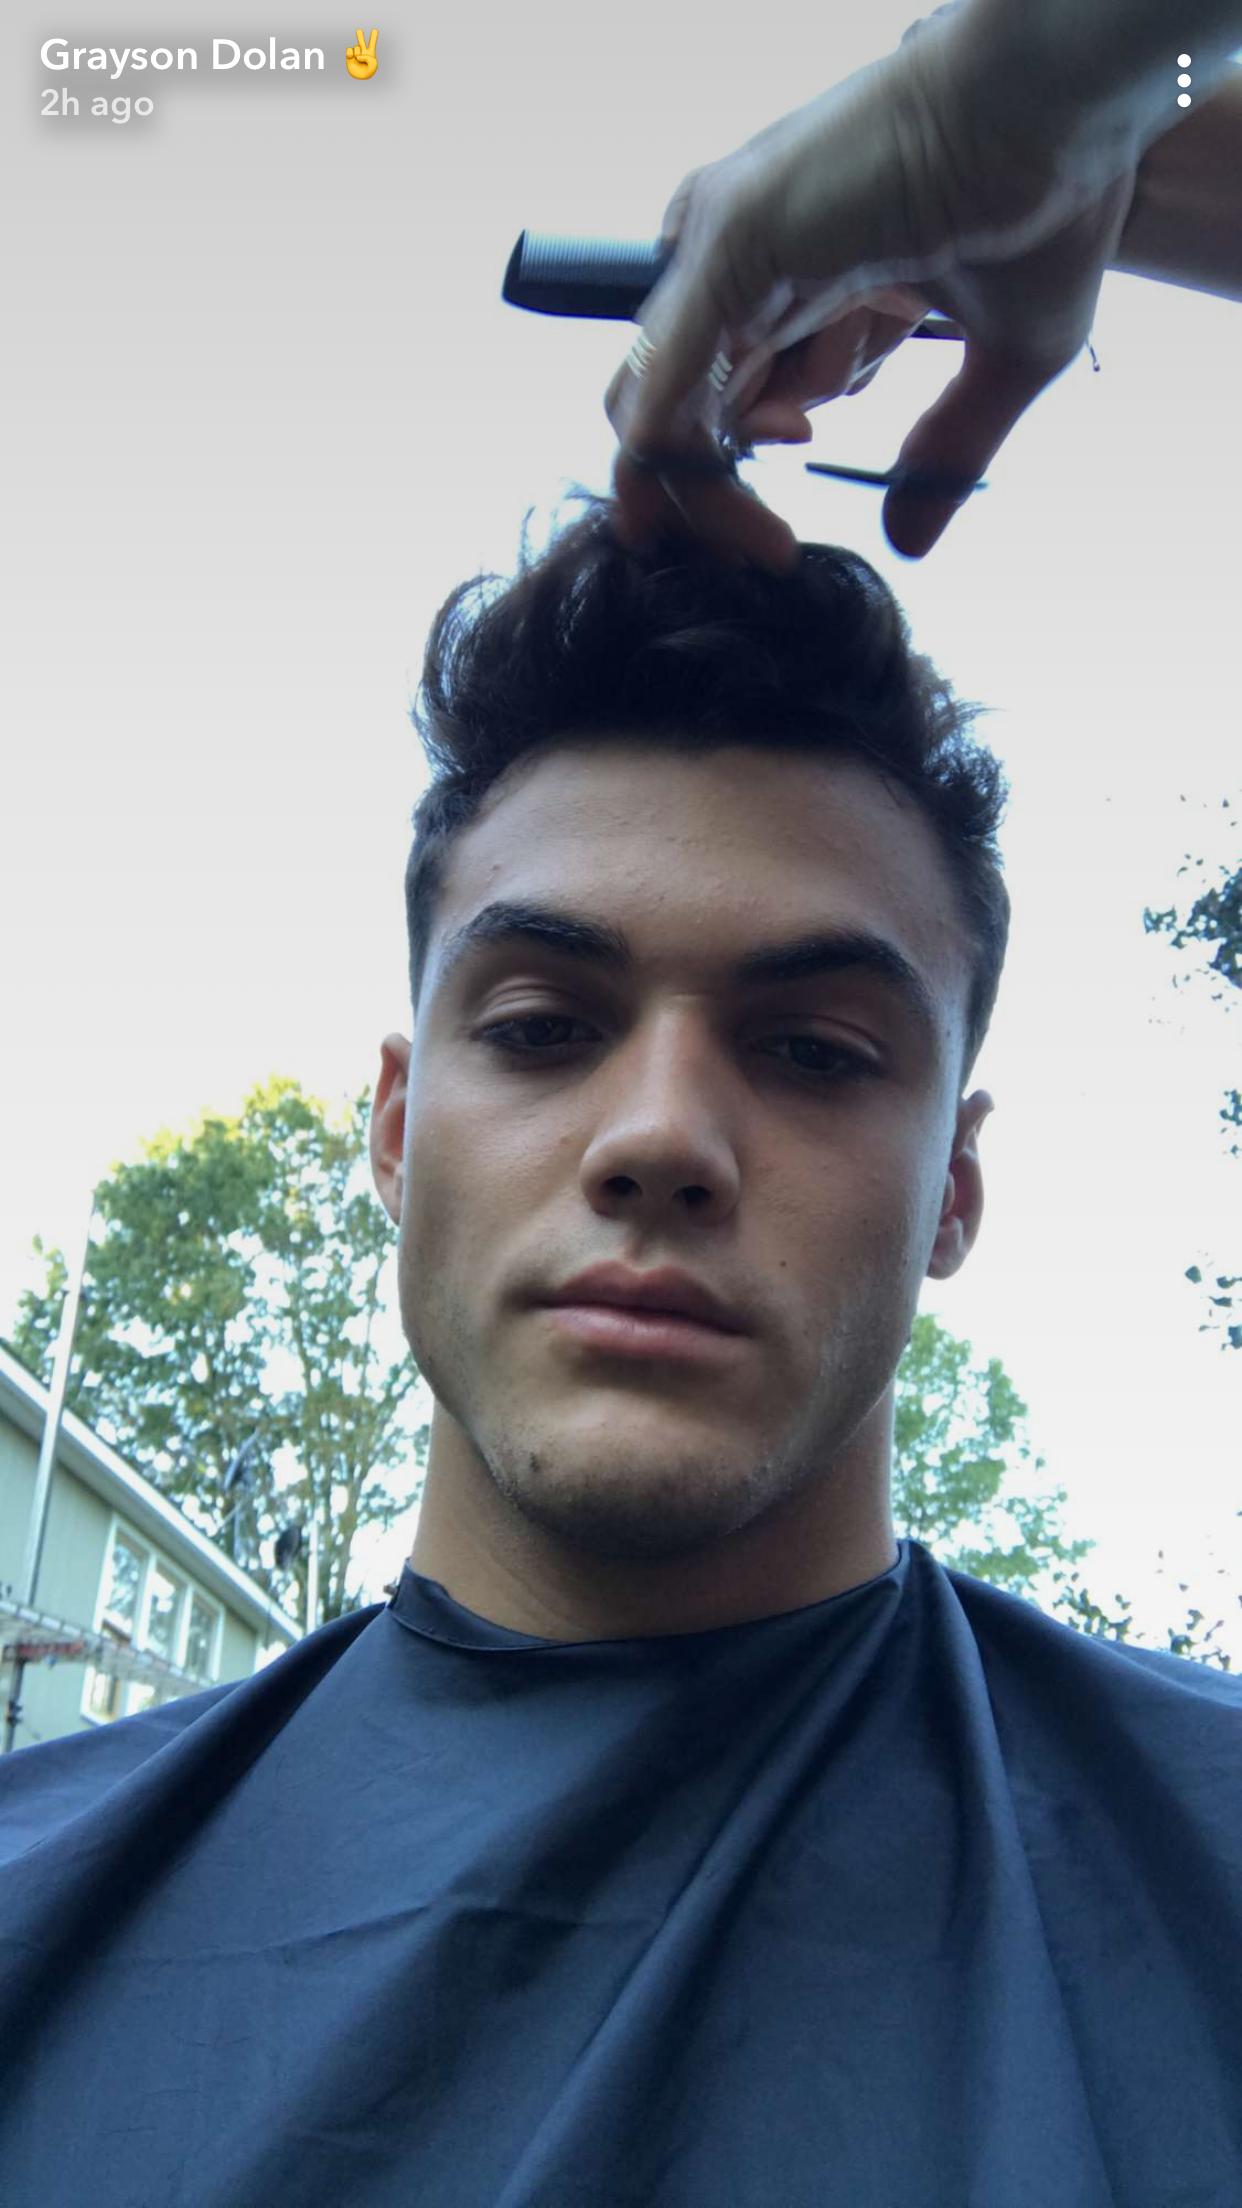 Grayson riggs snapchat